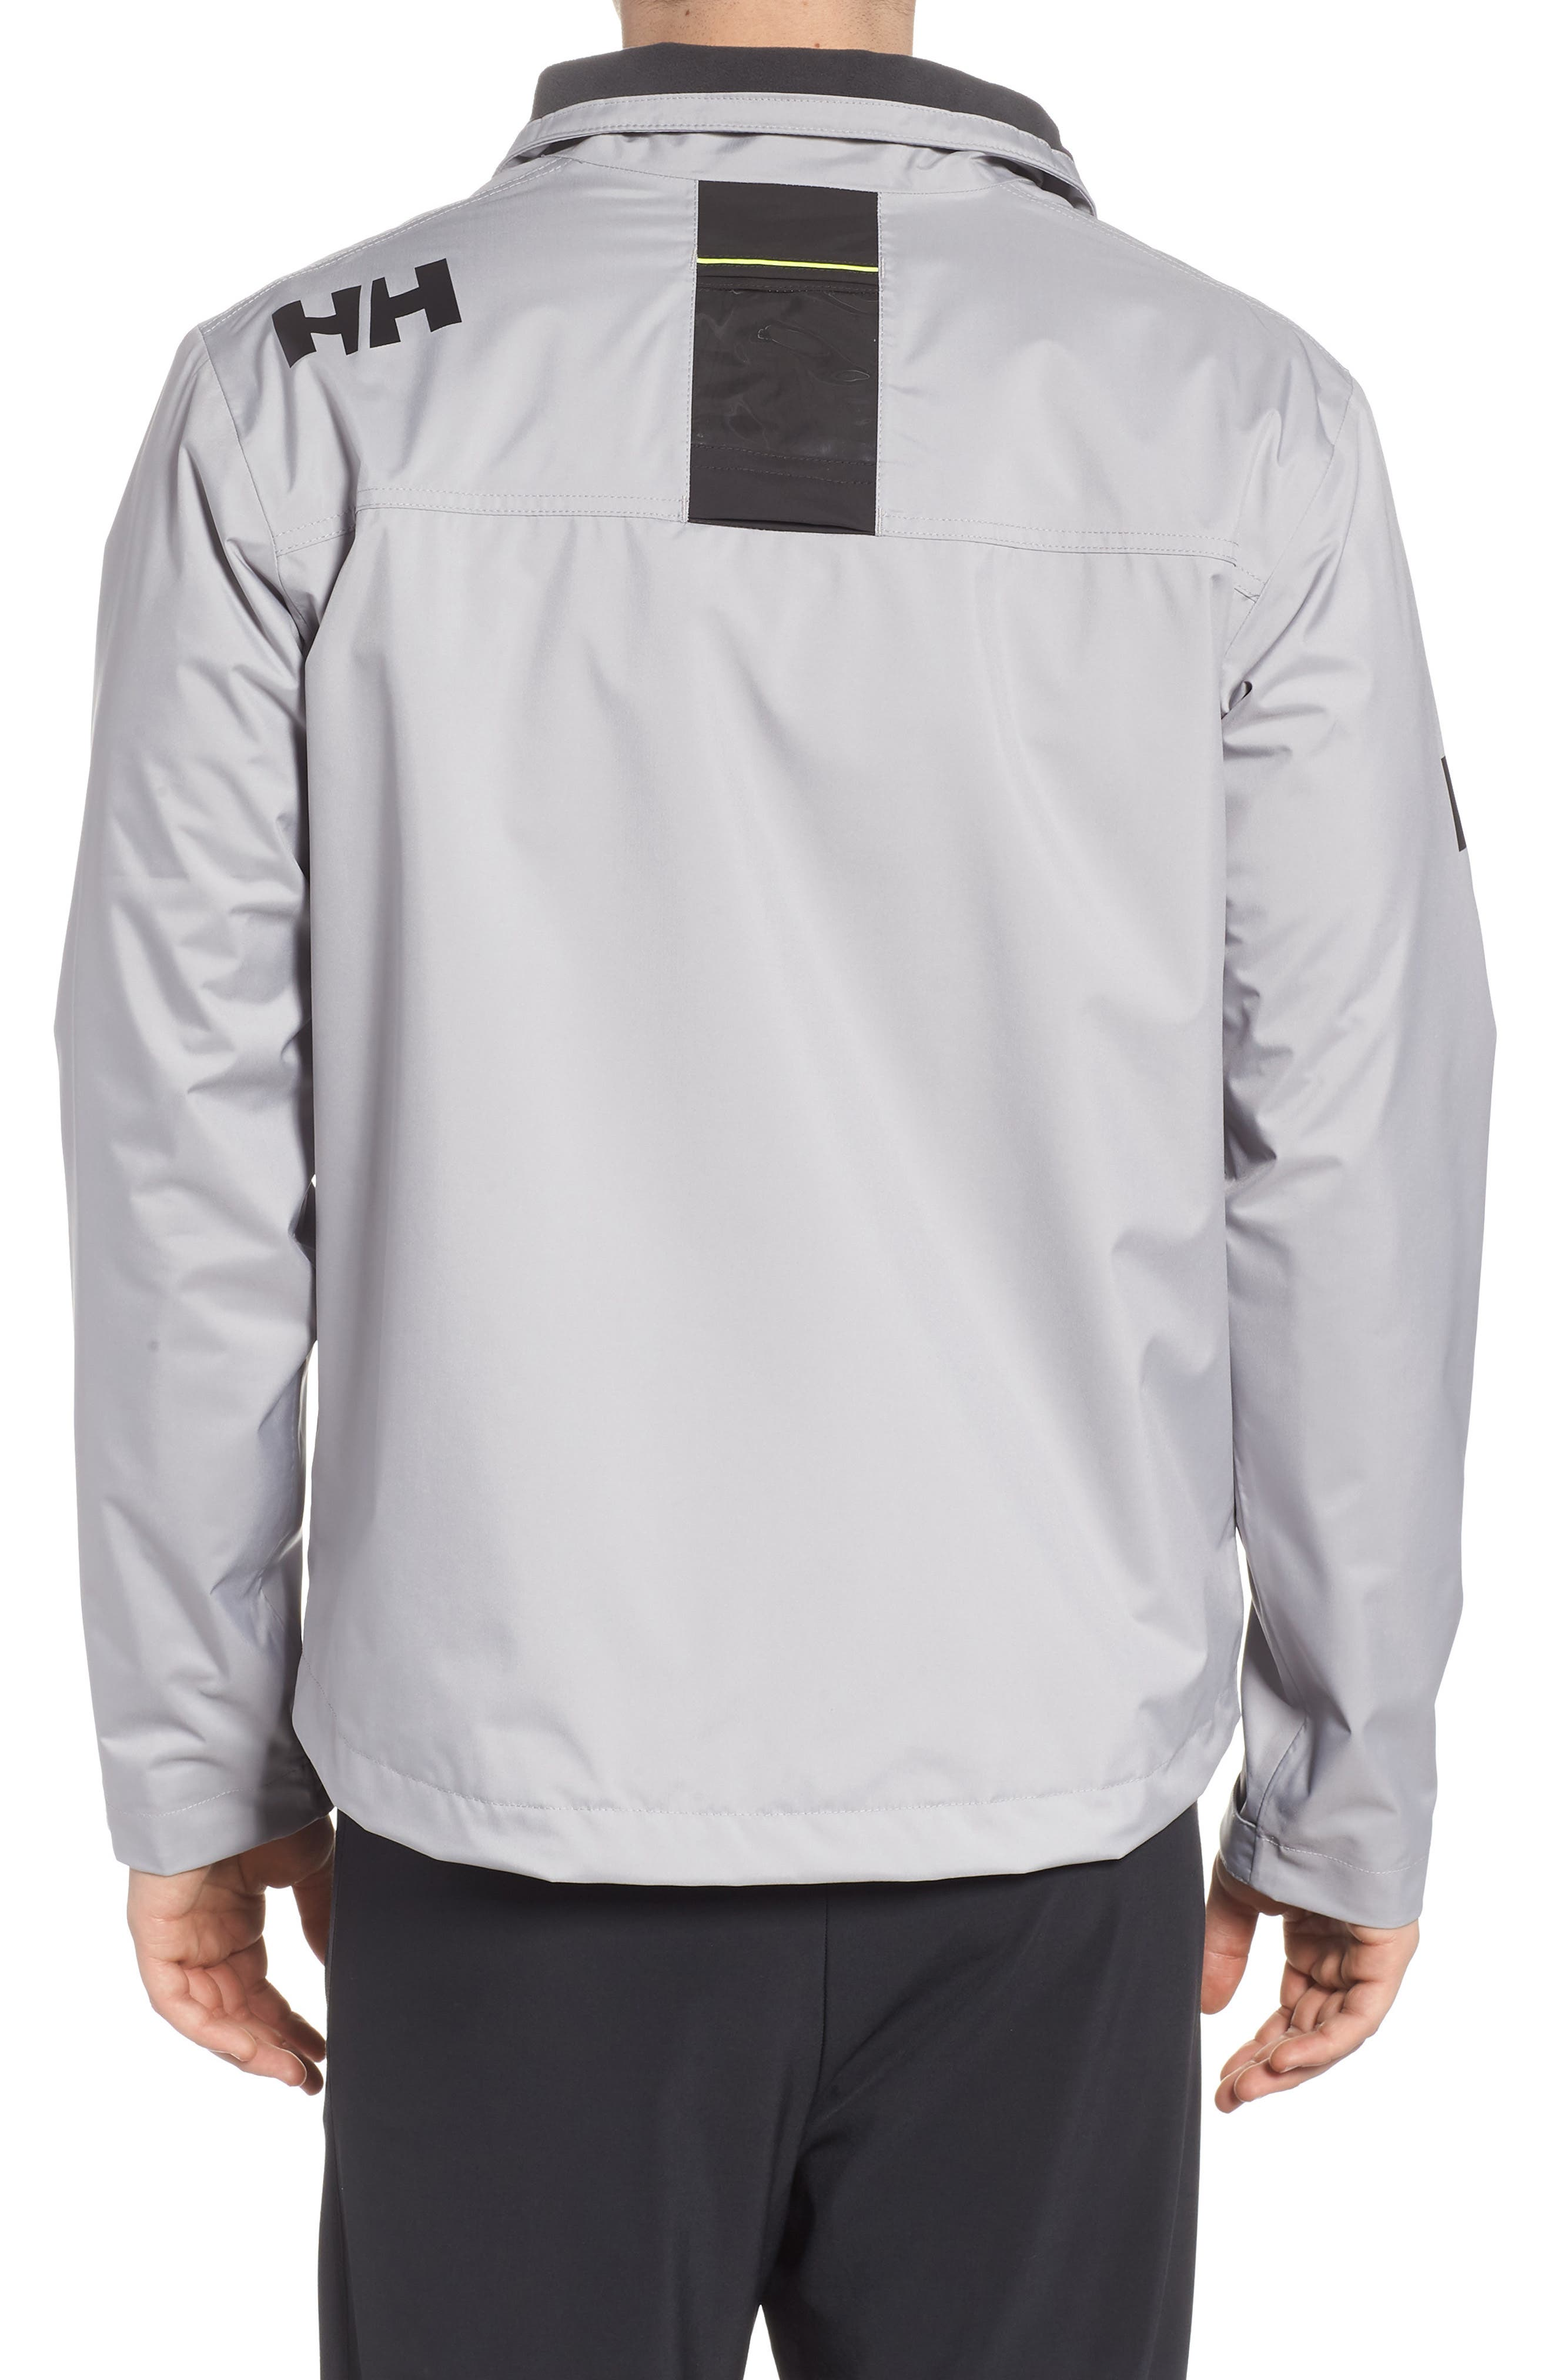 'Crew' Waterproof & Windproof Jacket,                             Alternate thumbnail 2, color,                             Silver Grey